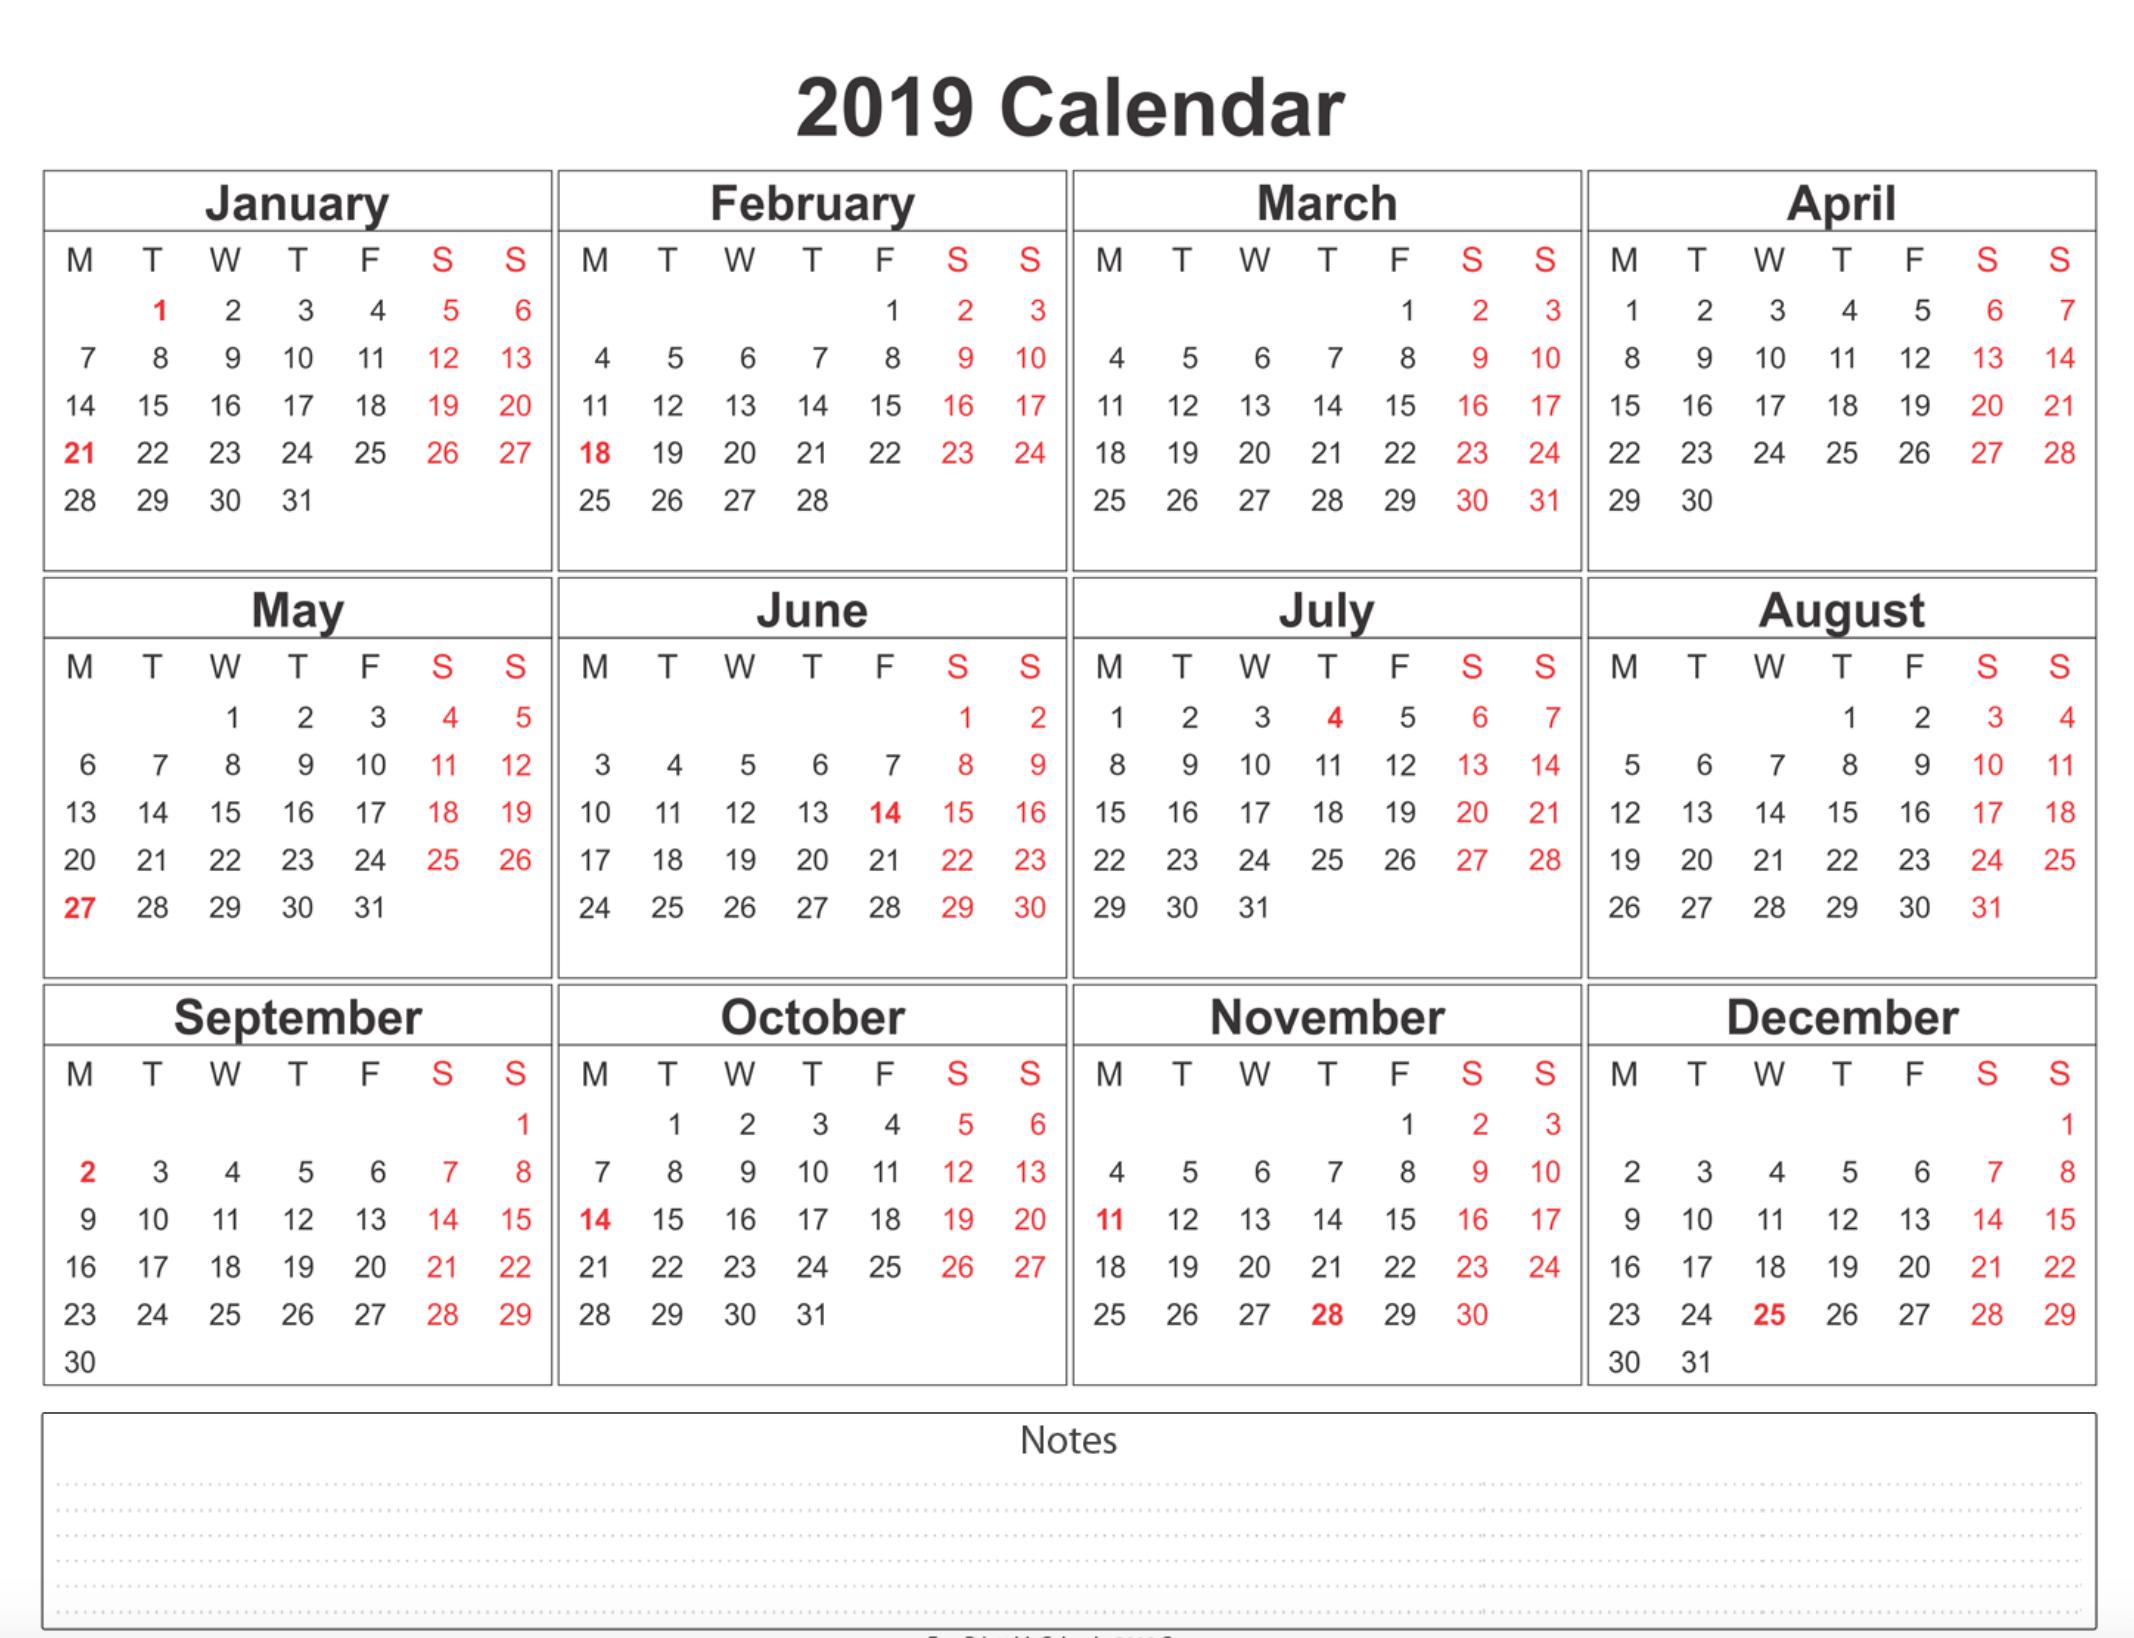 2019 Calendar - Amazonaws 3 Month Calendar Template Printable